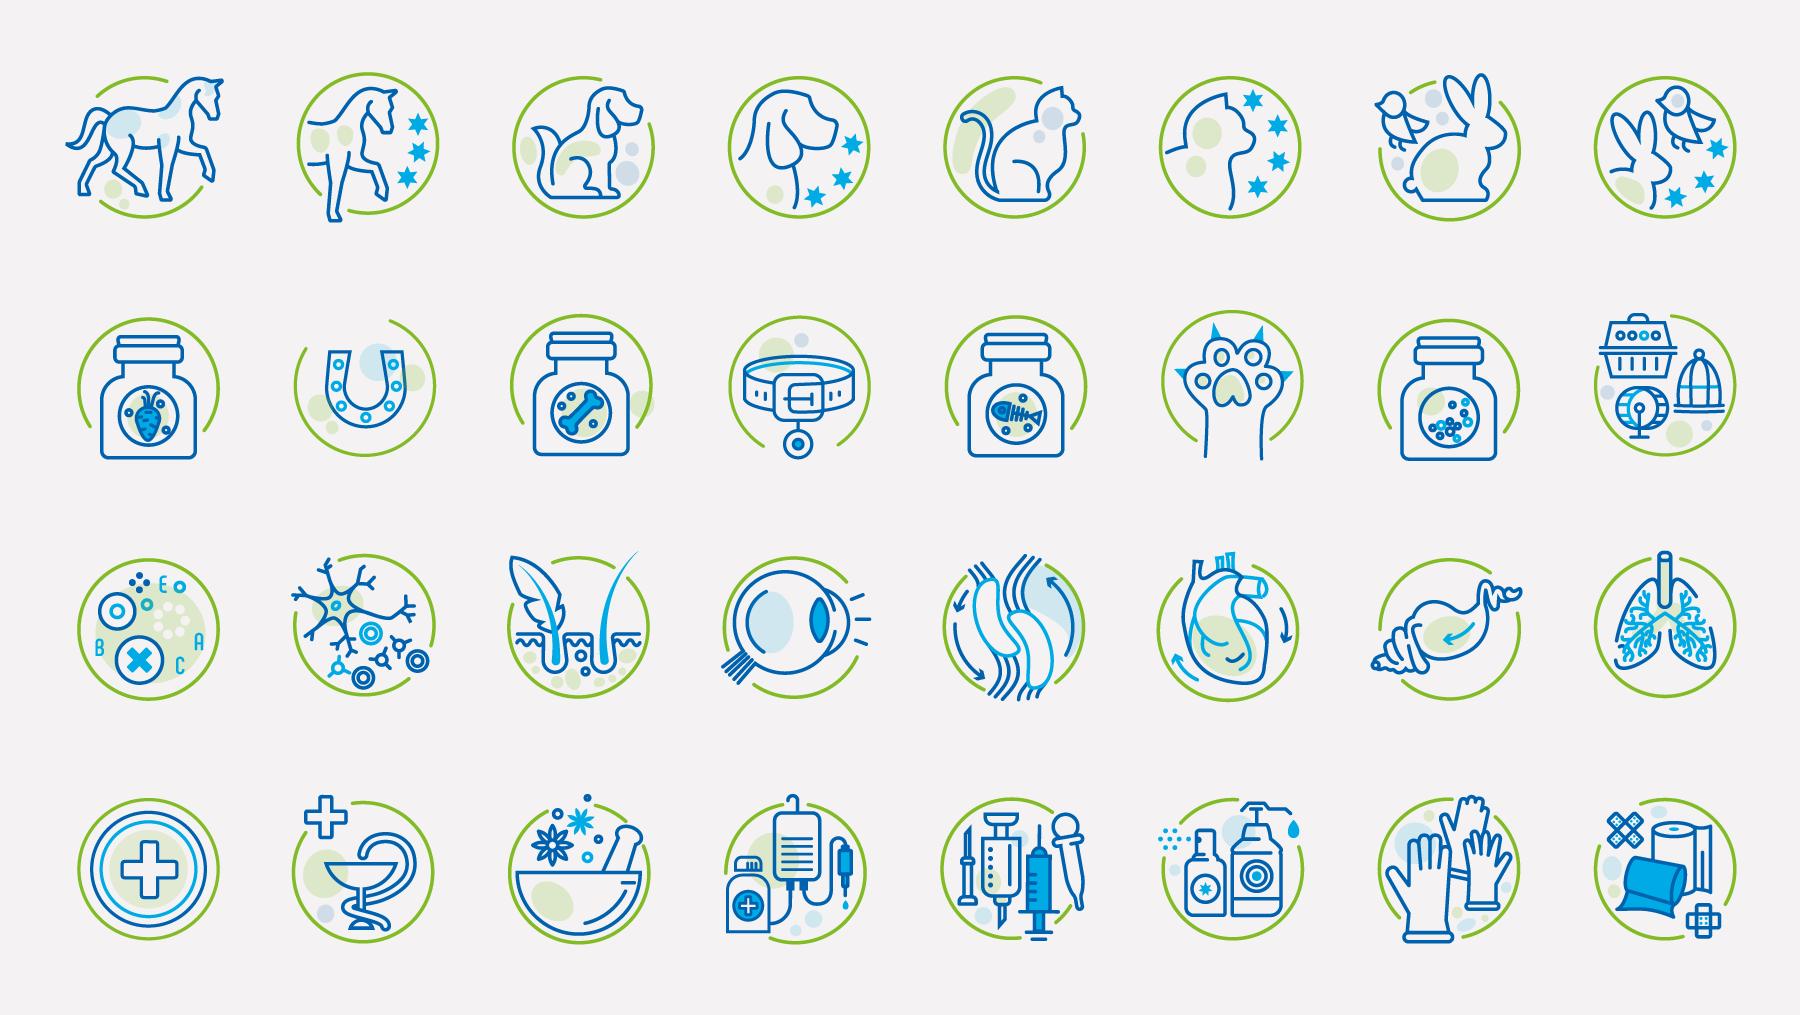 Piktogramme - Tier Medizin Veterinaer Icon